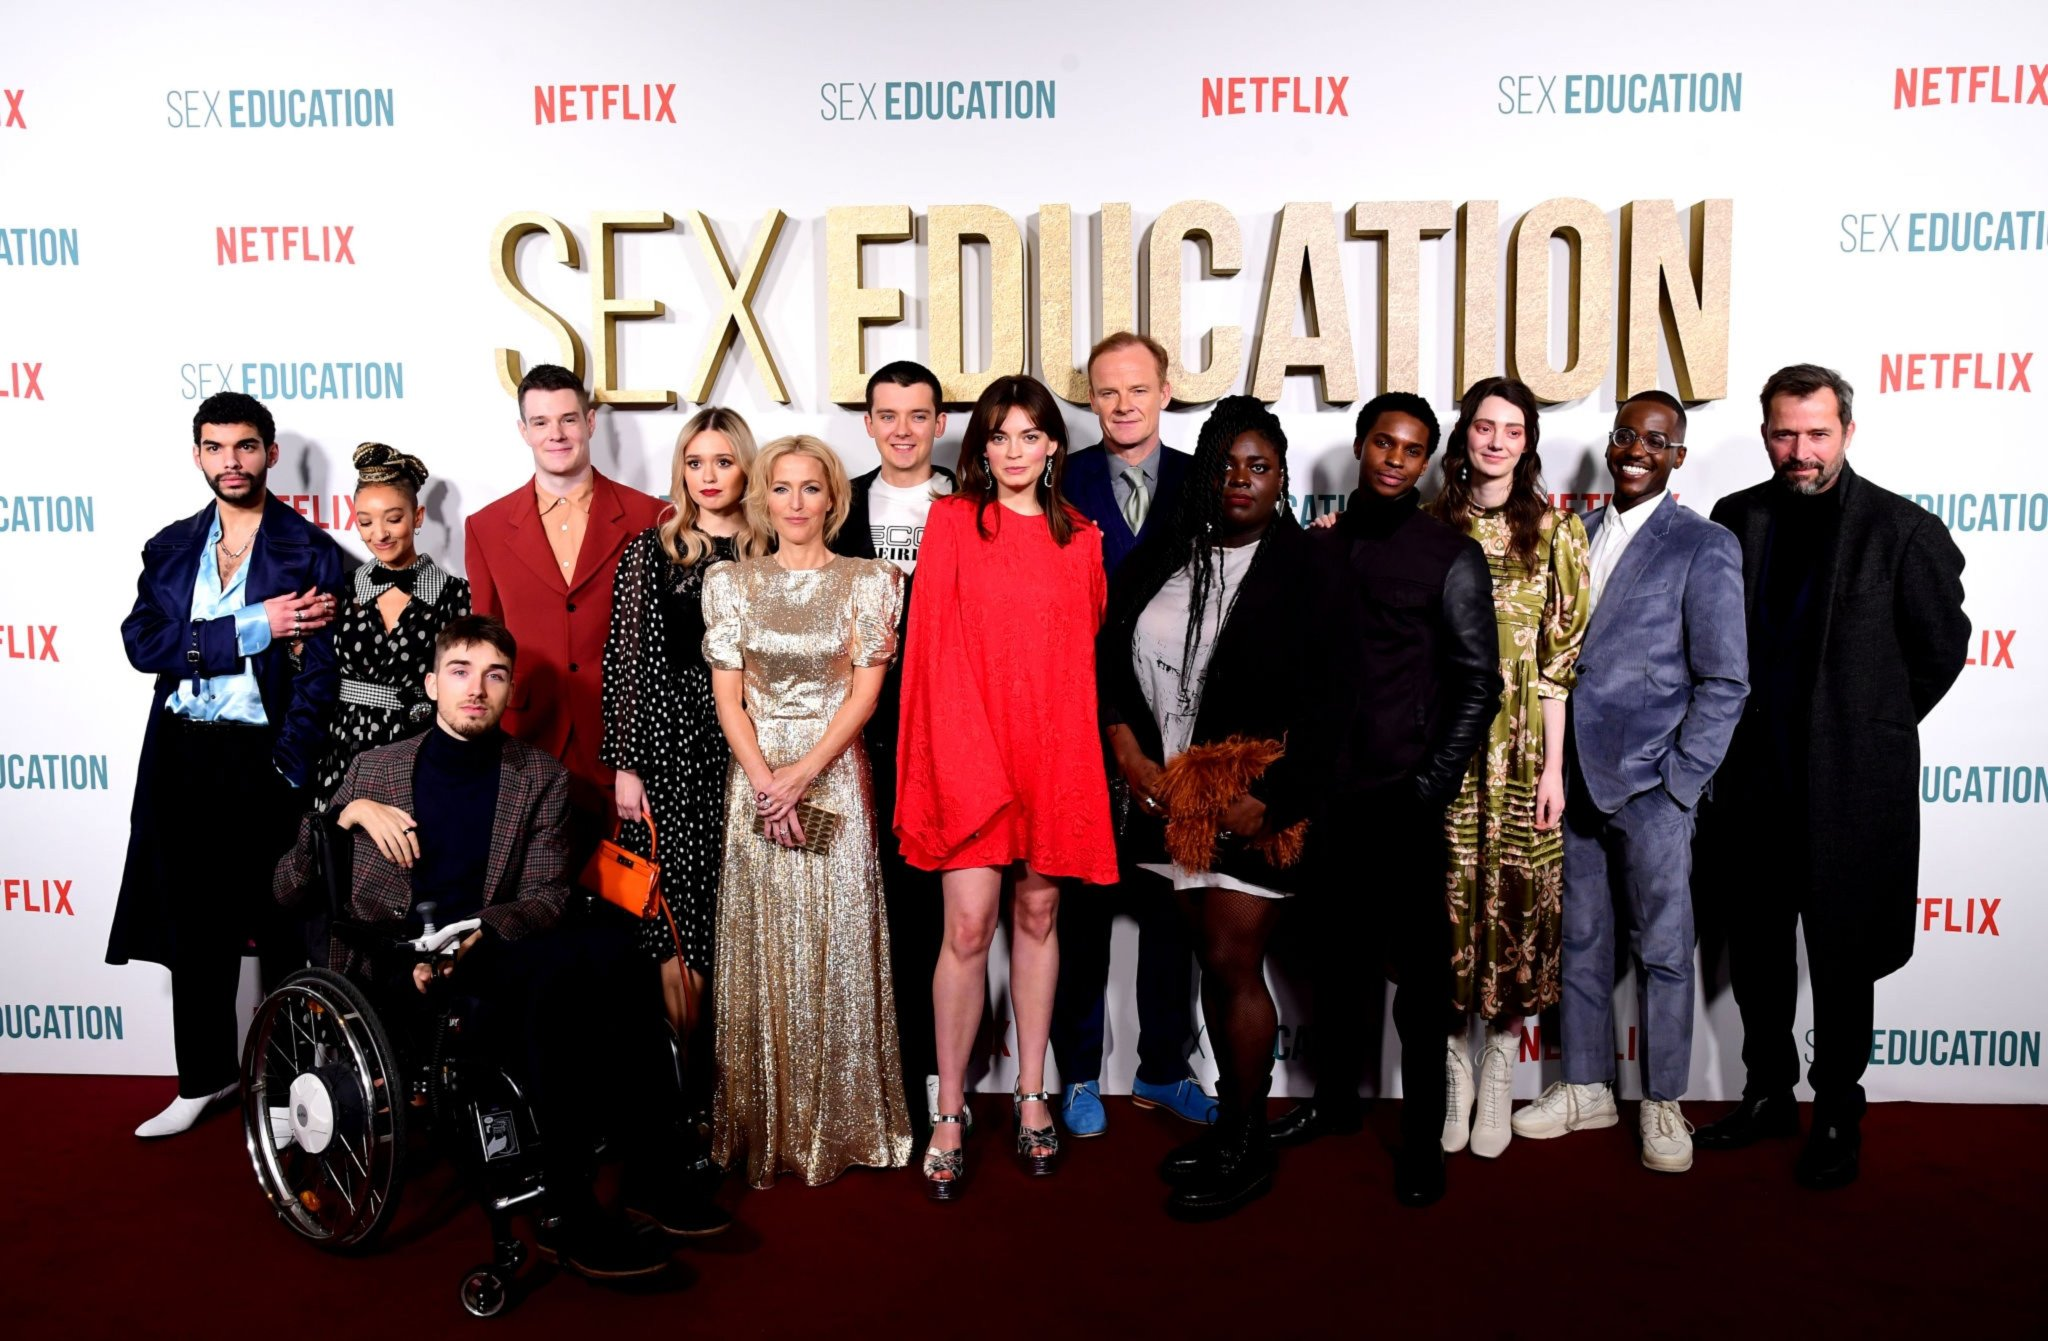 Elenco Sex Education